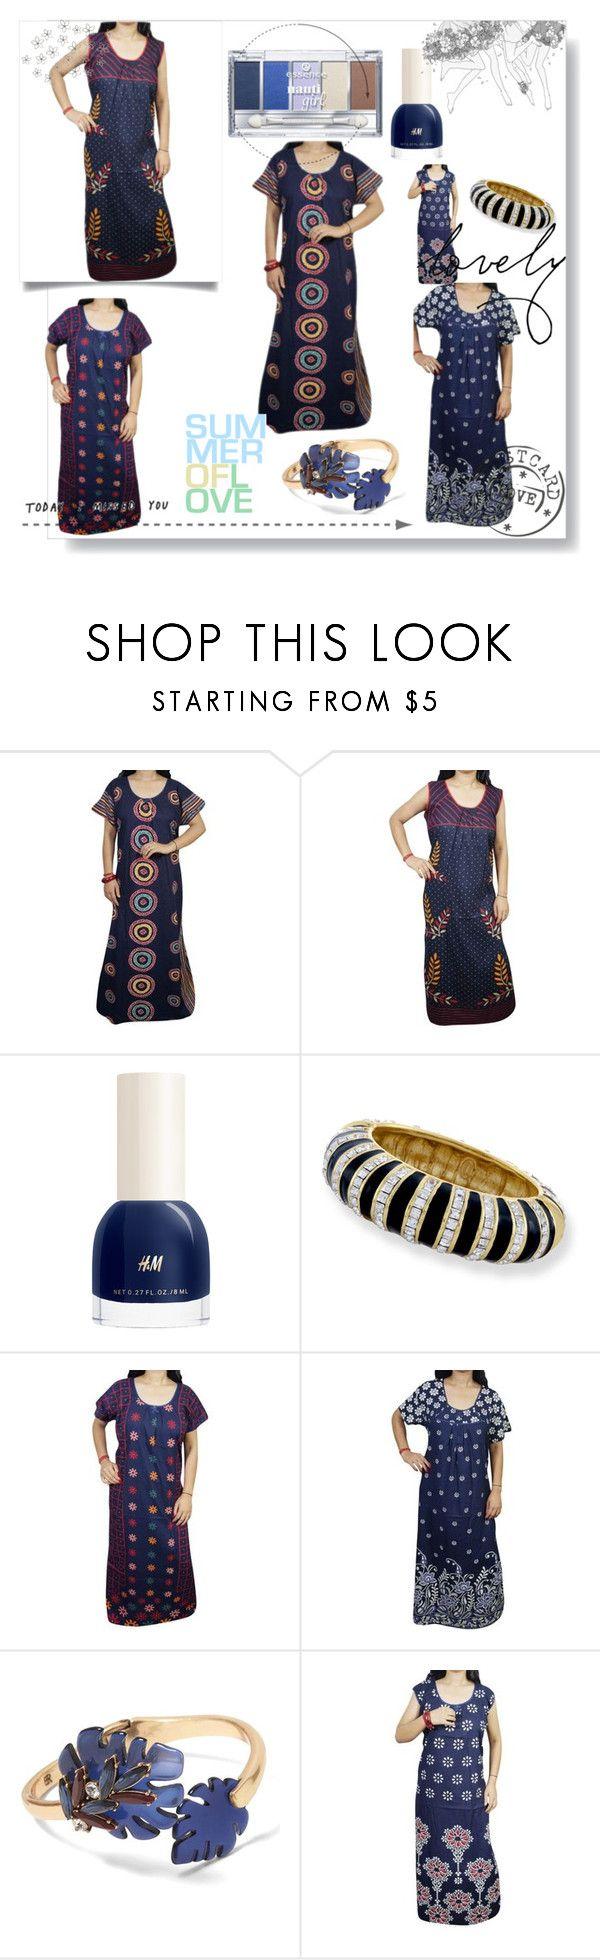 """Womens Cotton Blue Nighty"" by royalimports ❤ liked on Polyvore featuring H&M, Kenneth Jay Lane, Banana Republic, WALL, sleepwear, Nightwear, women, nighty and maxinighty"